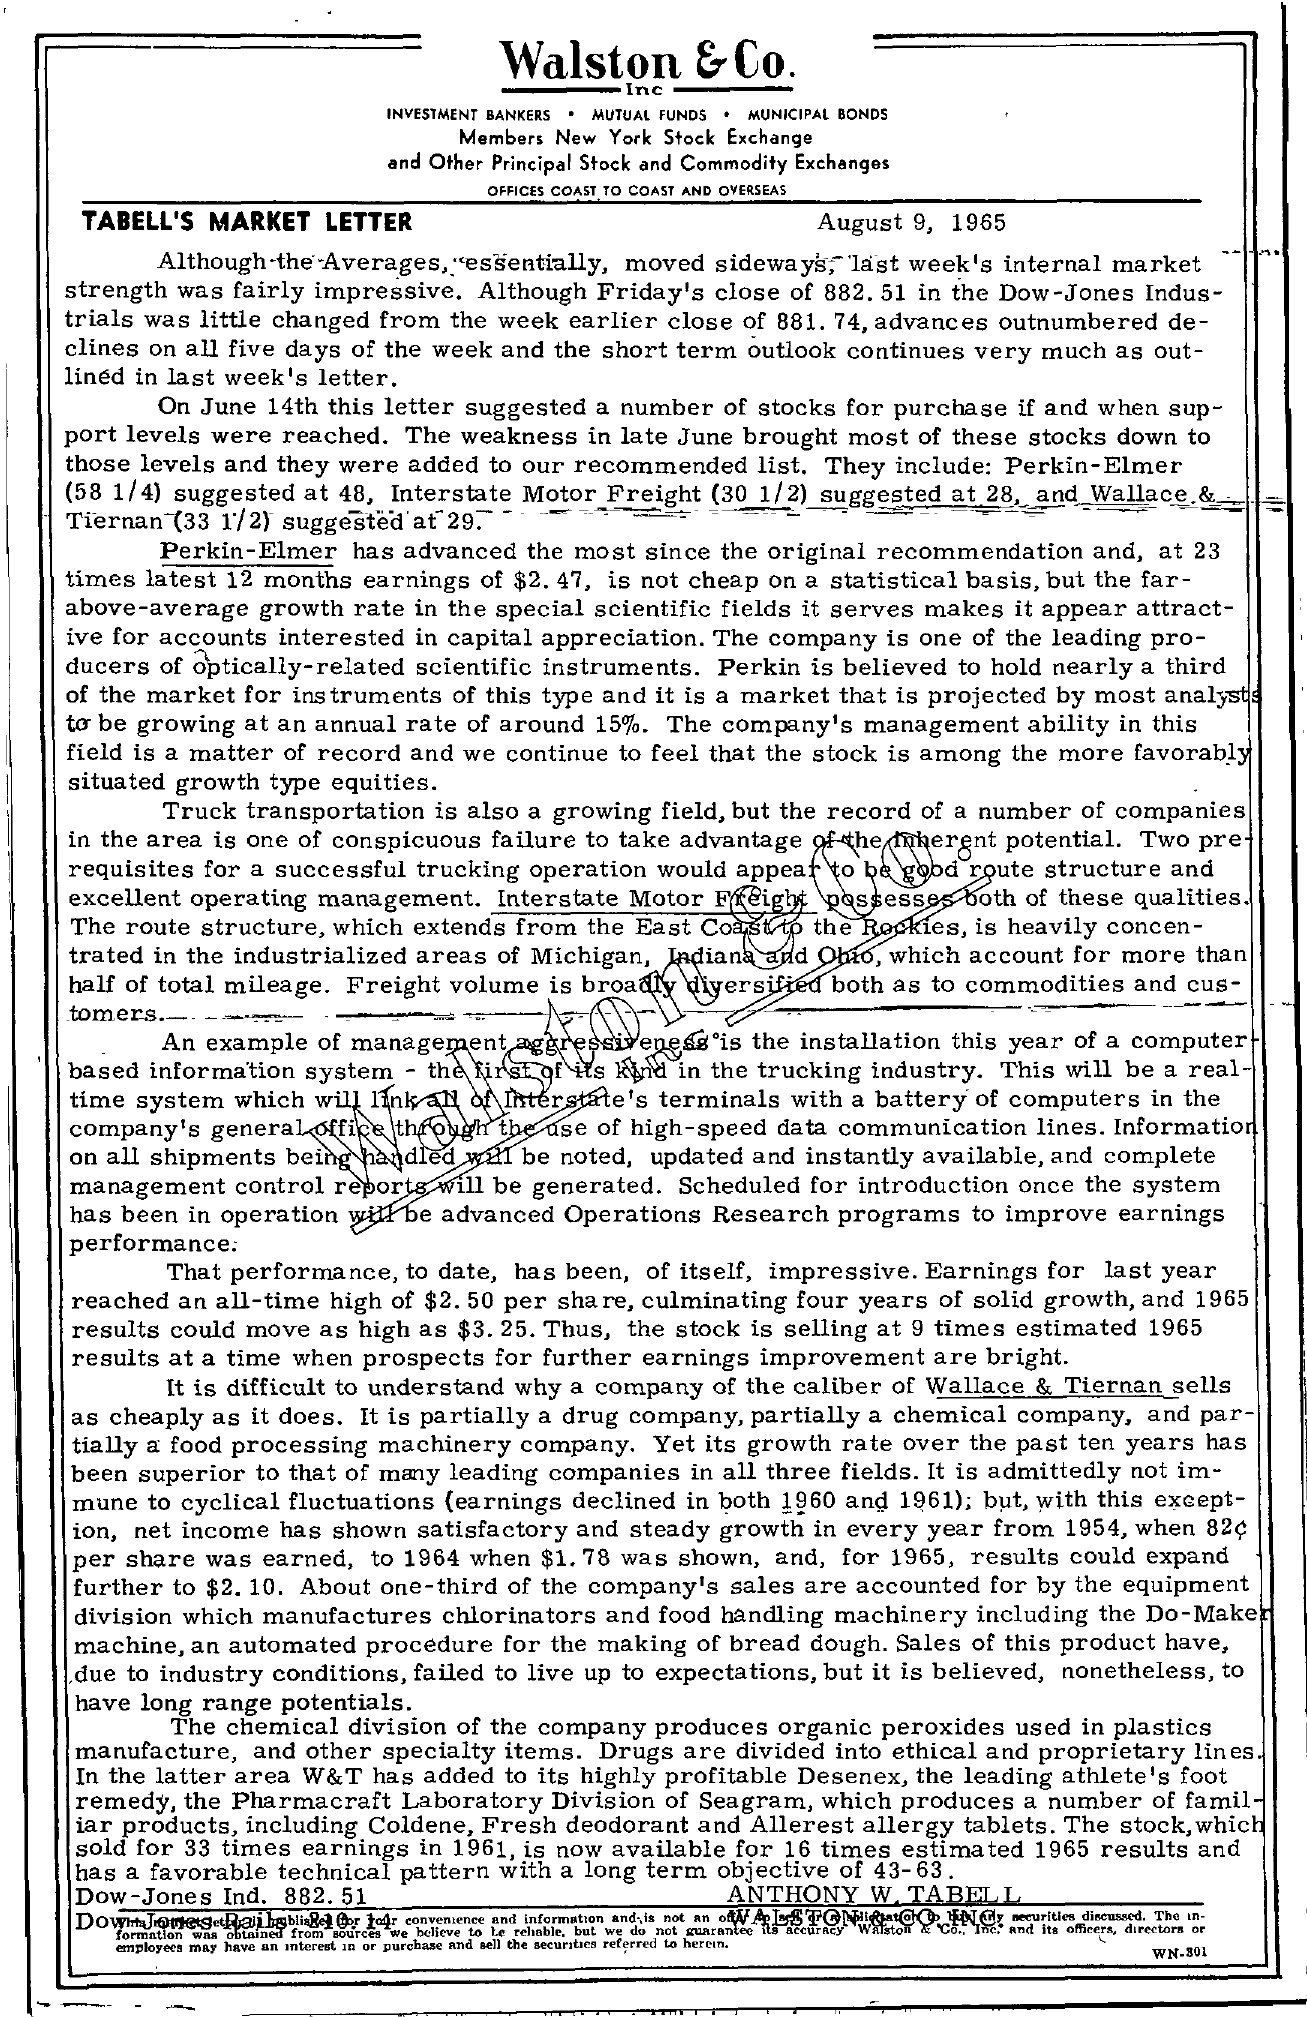 Tabell's Market Letter - August 09, 1965